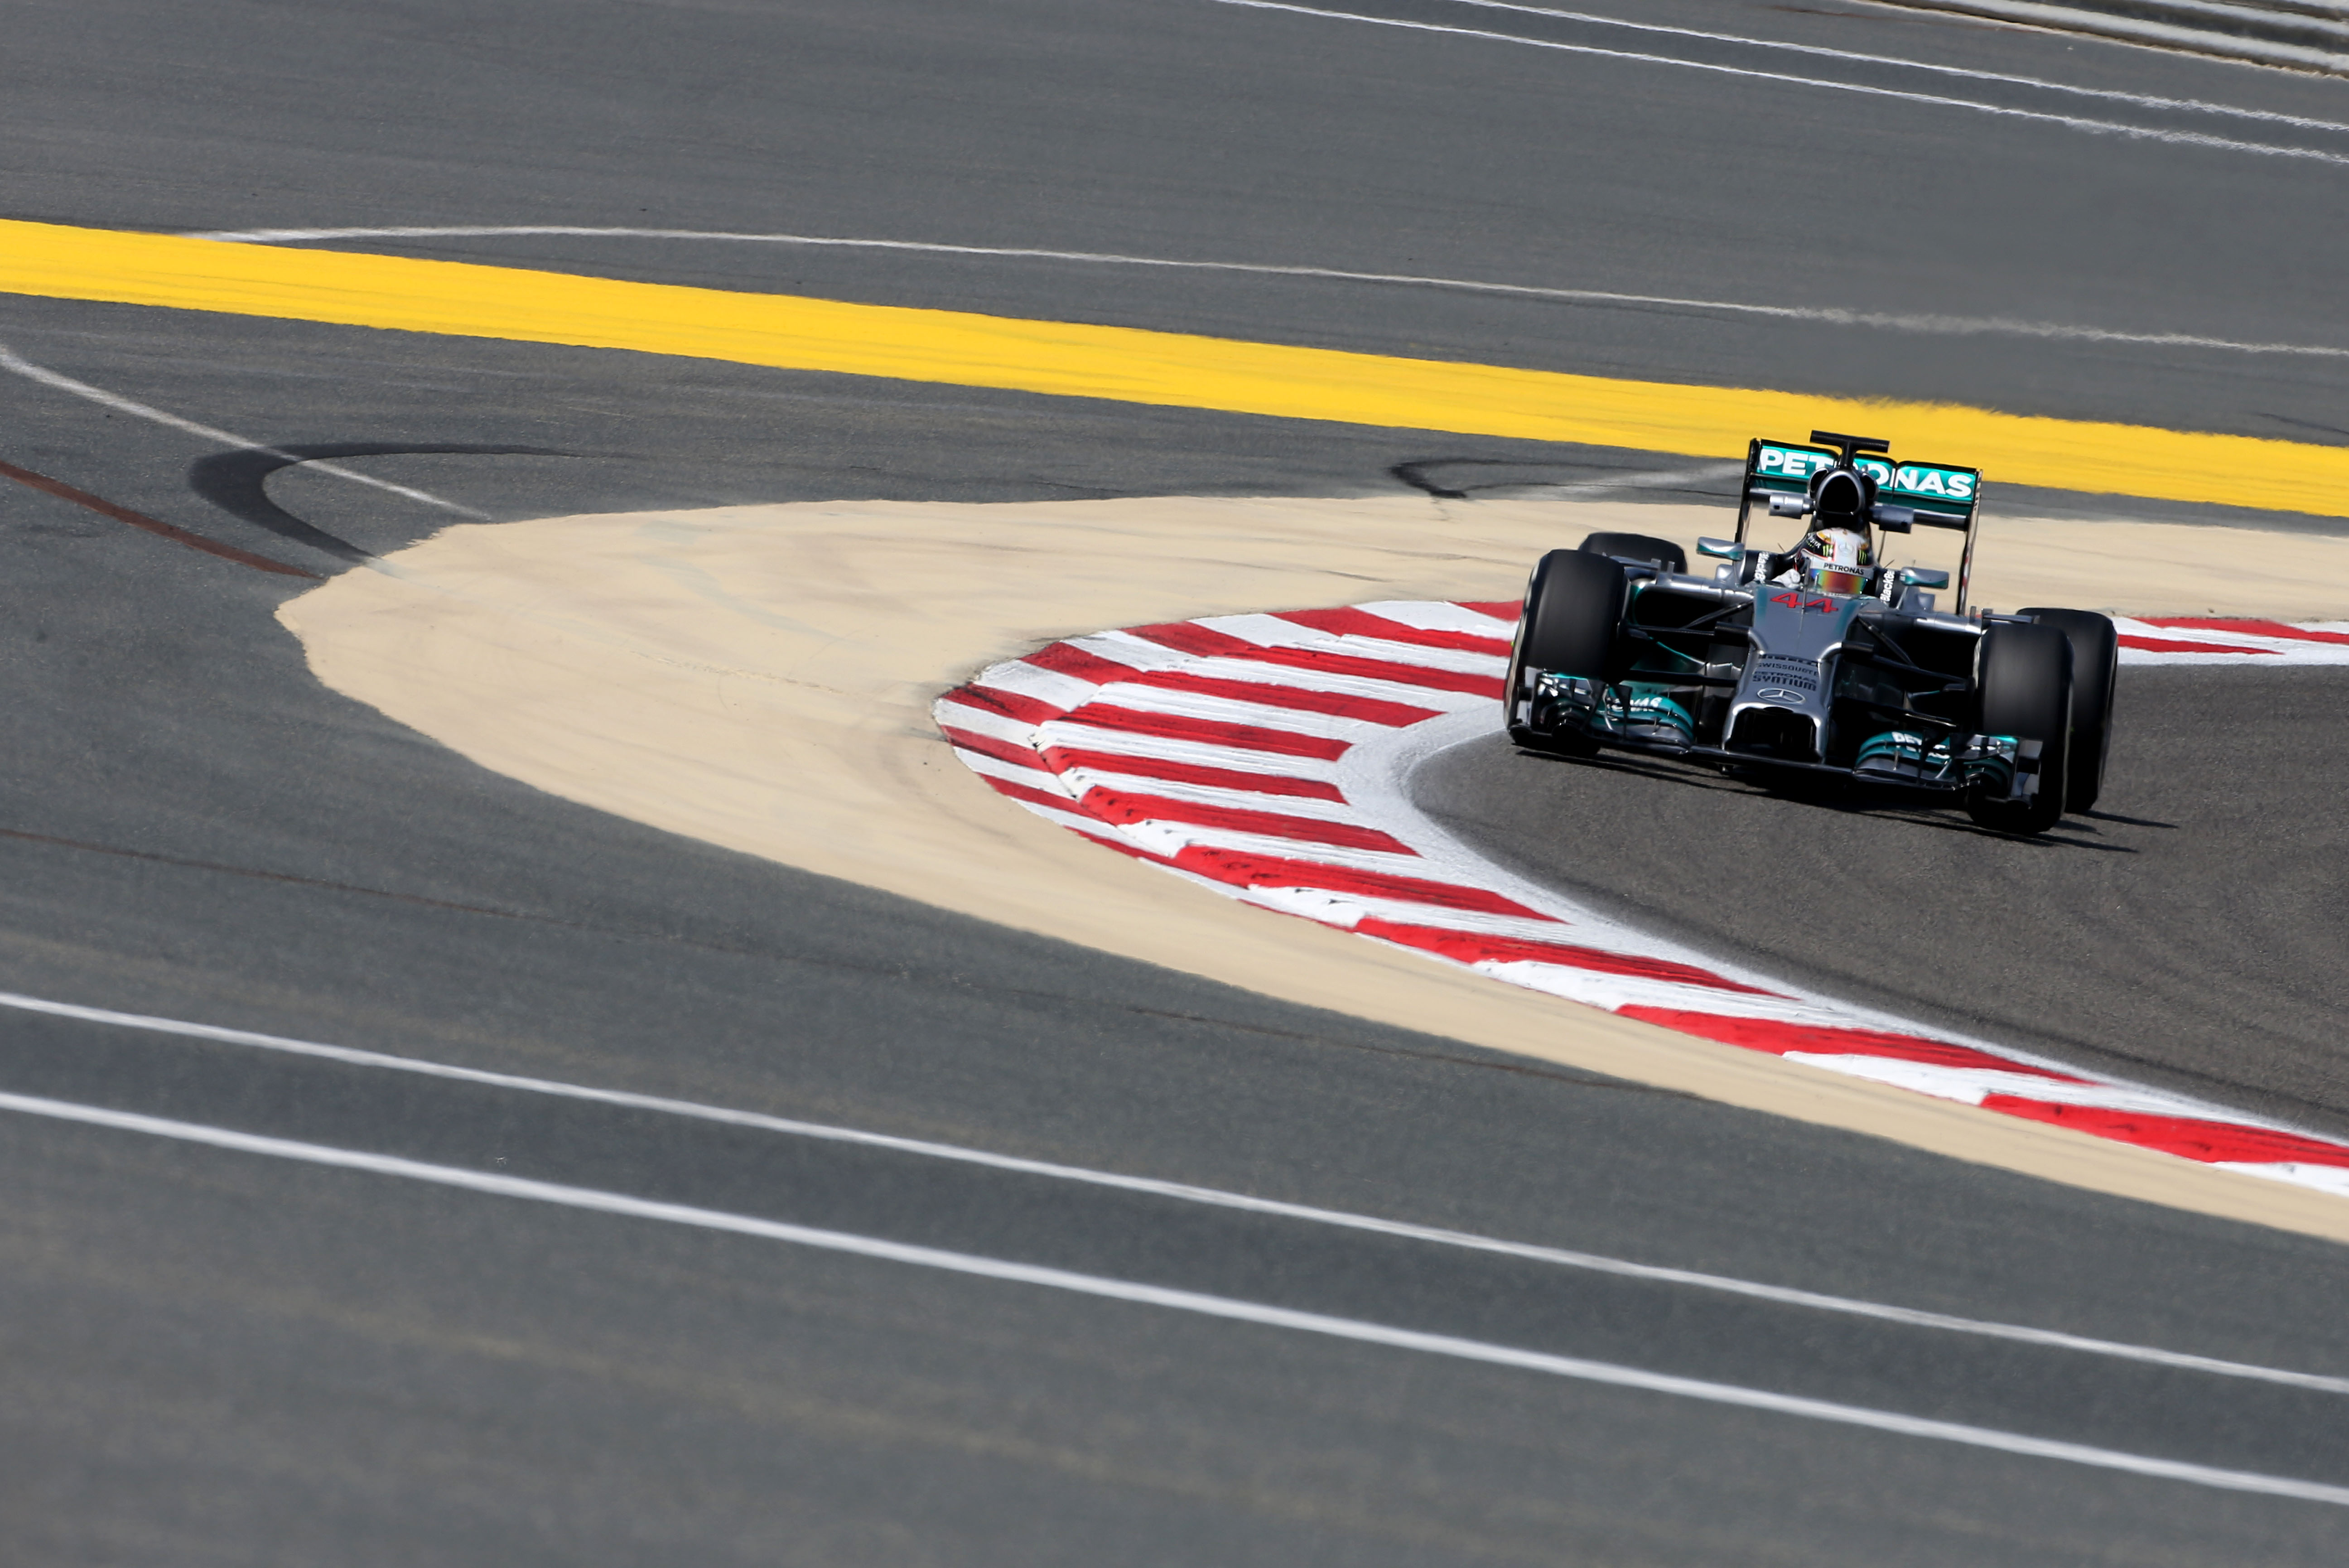 Lewis Hamilton Mercedes Bahrain F1 2014